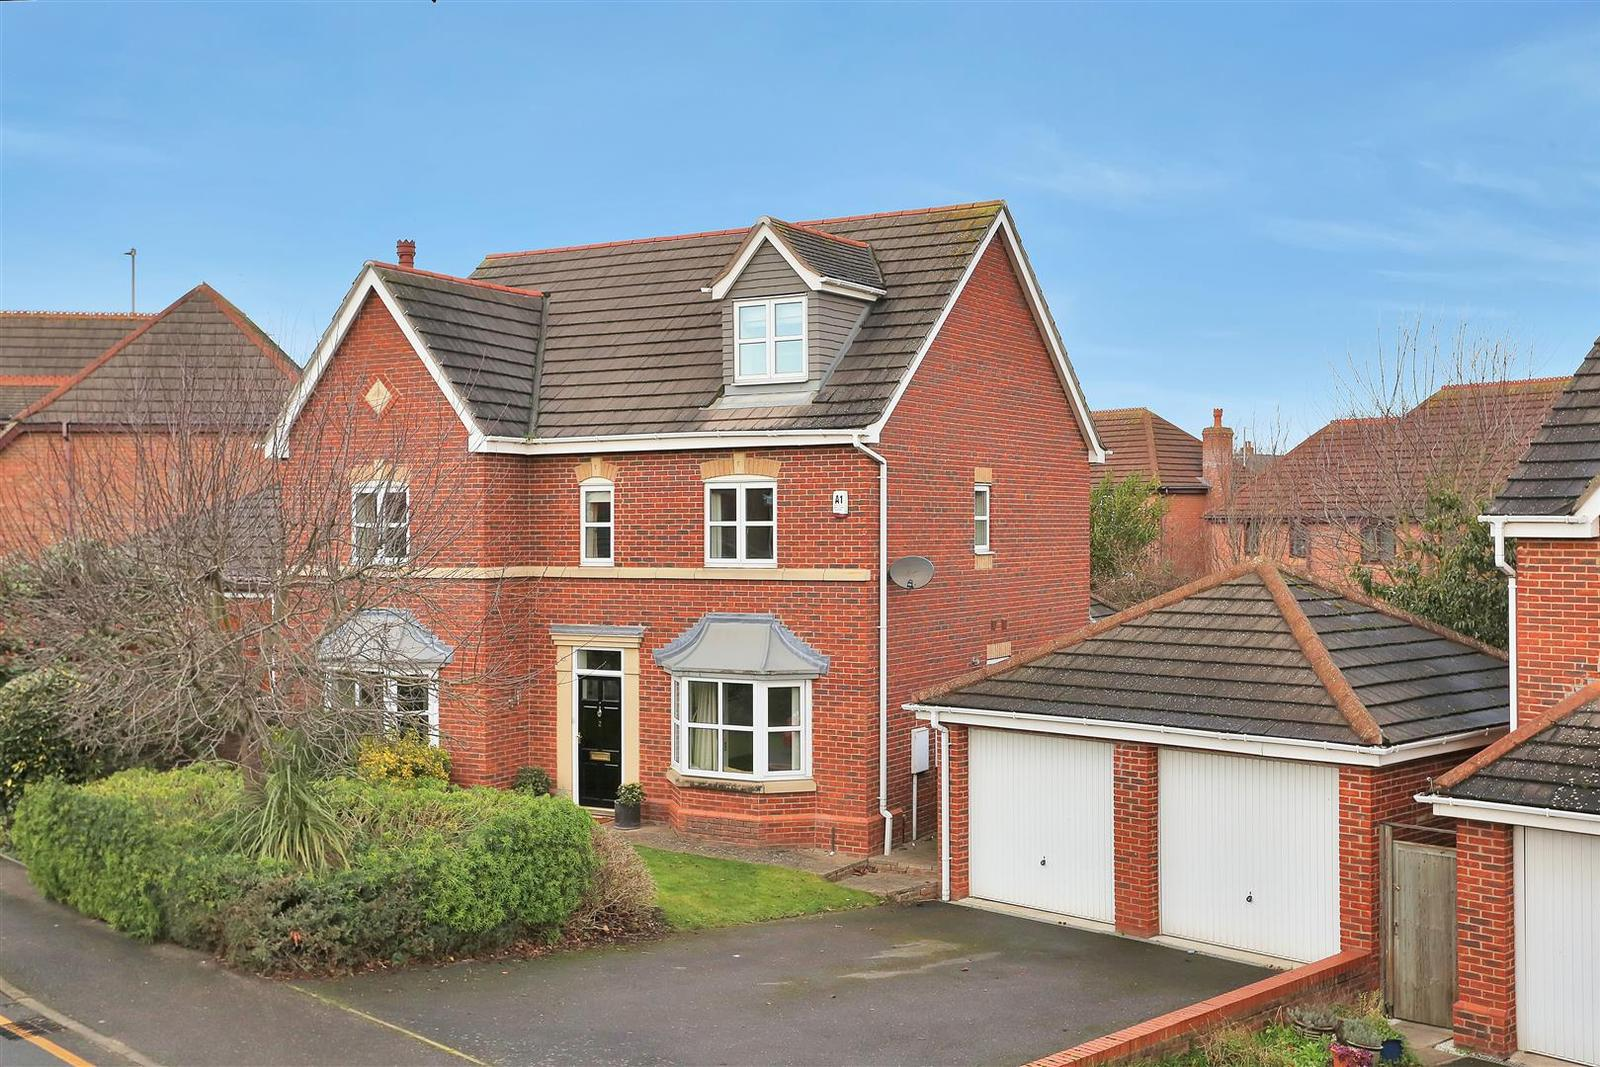 5 Bedrooms Property for sale in Langford Gardens, Grantham